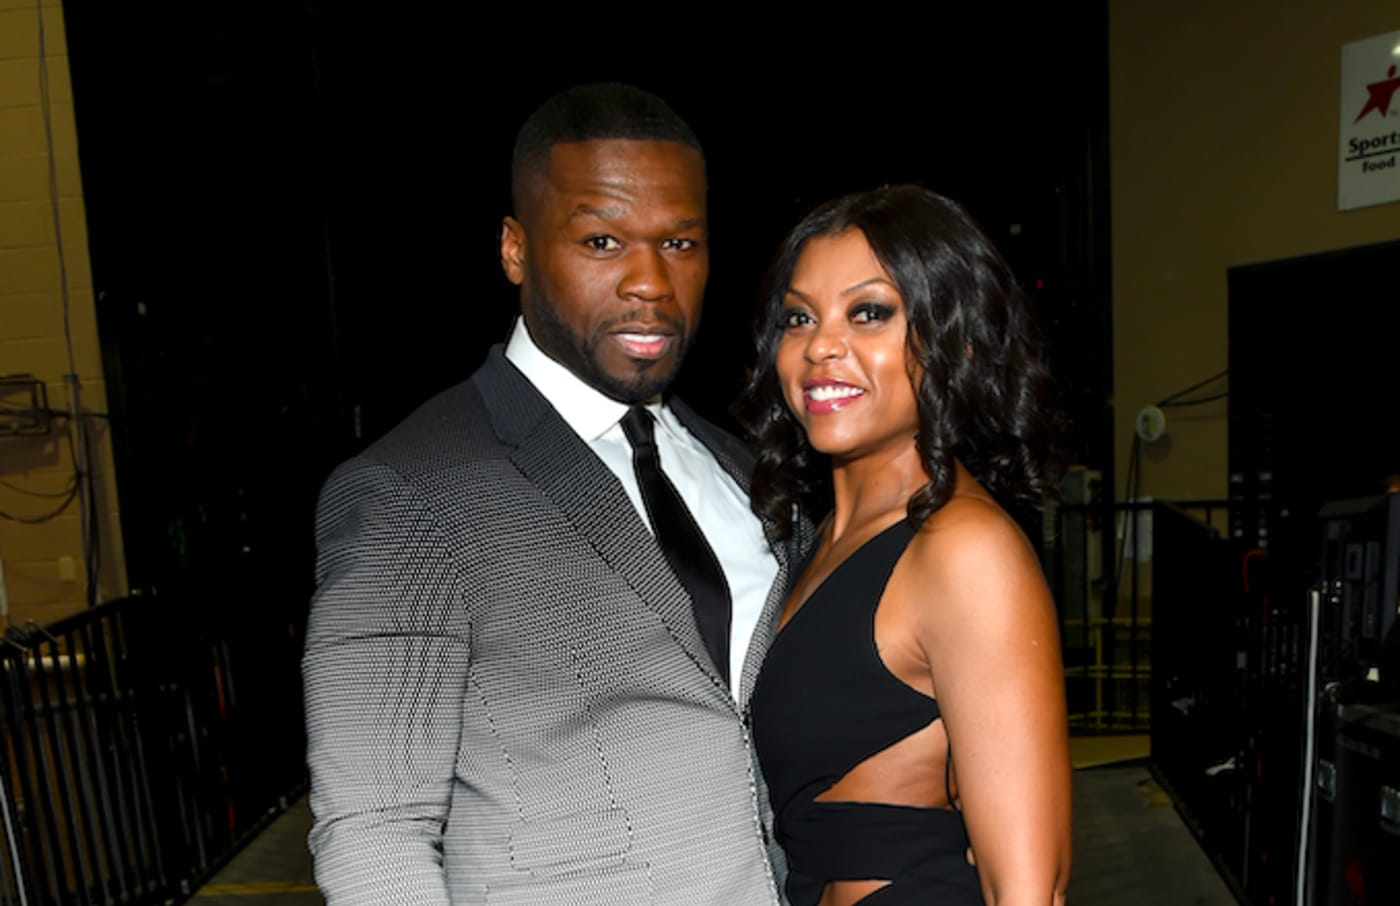 50 Cent and Taraji P. Henson